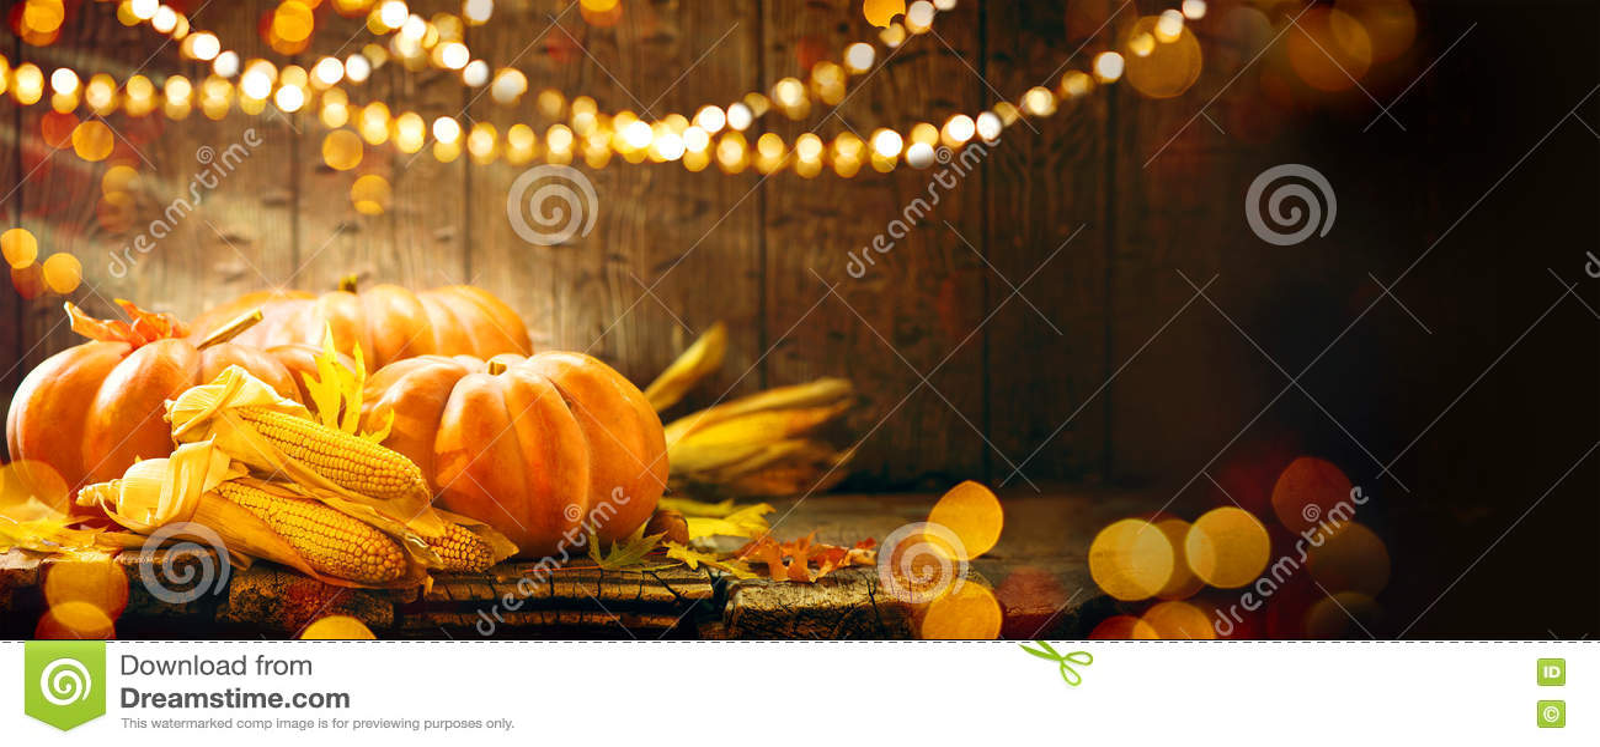 Autumn Thanksgiving pumpkins over wooden background